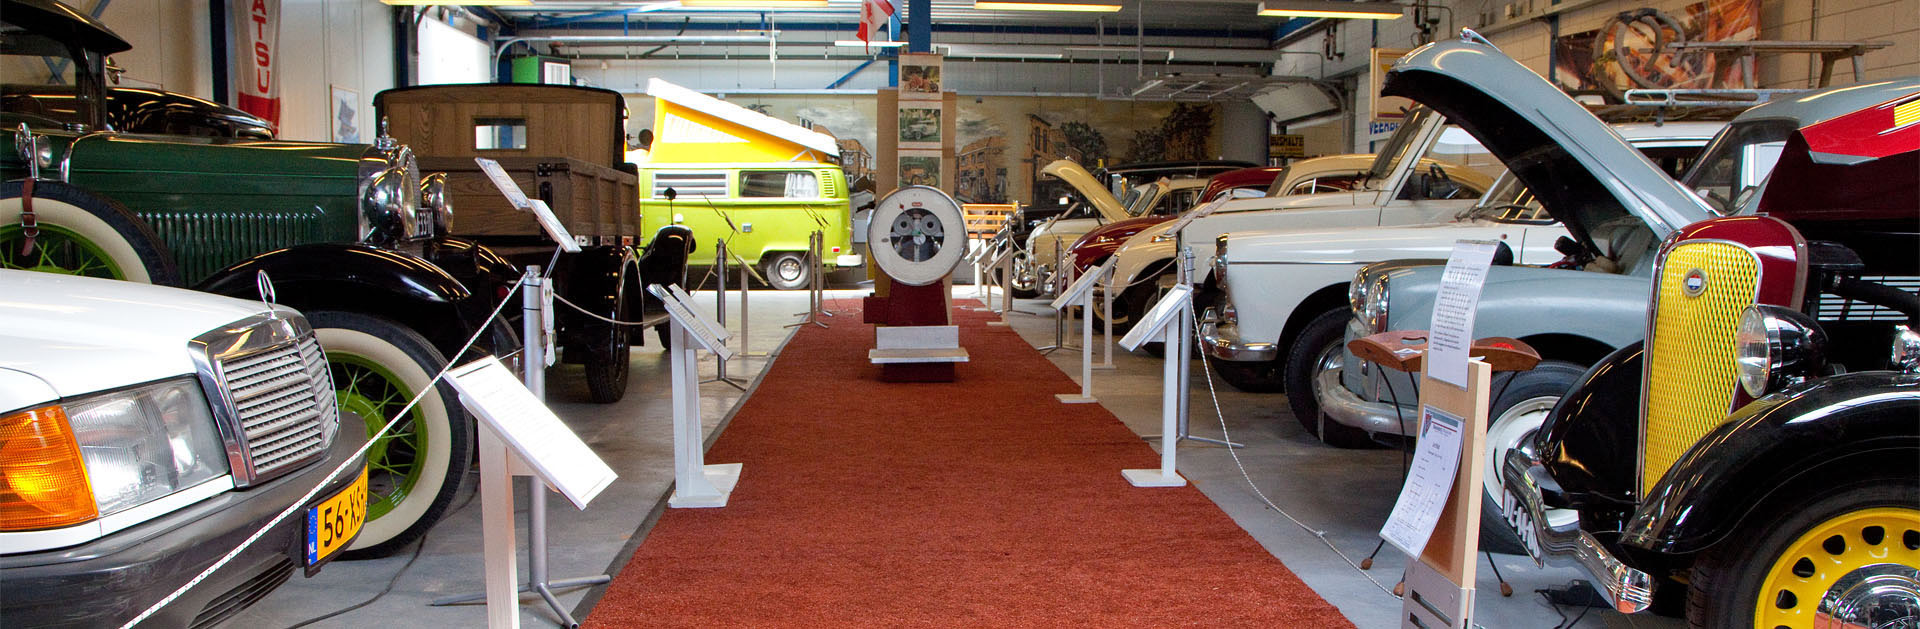 Achterhoeks Oldtimer Museum - Dinxperlo